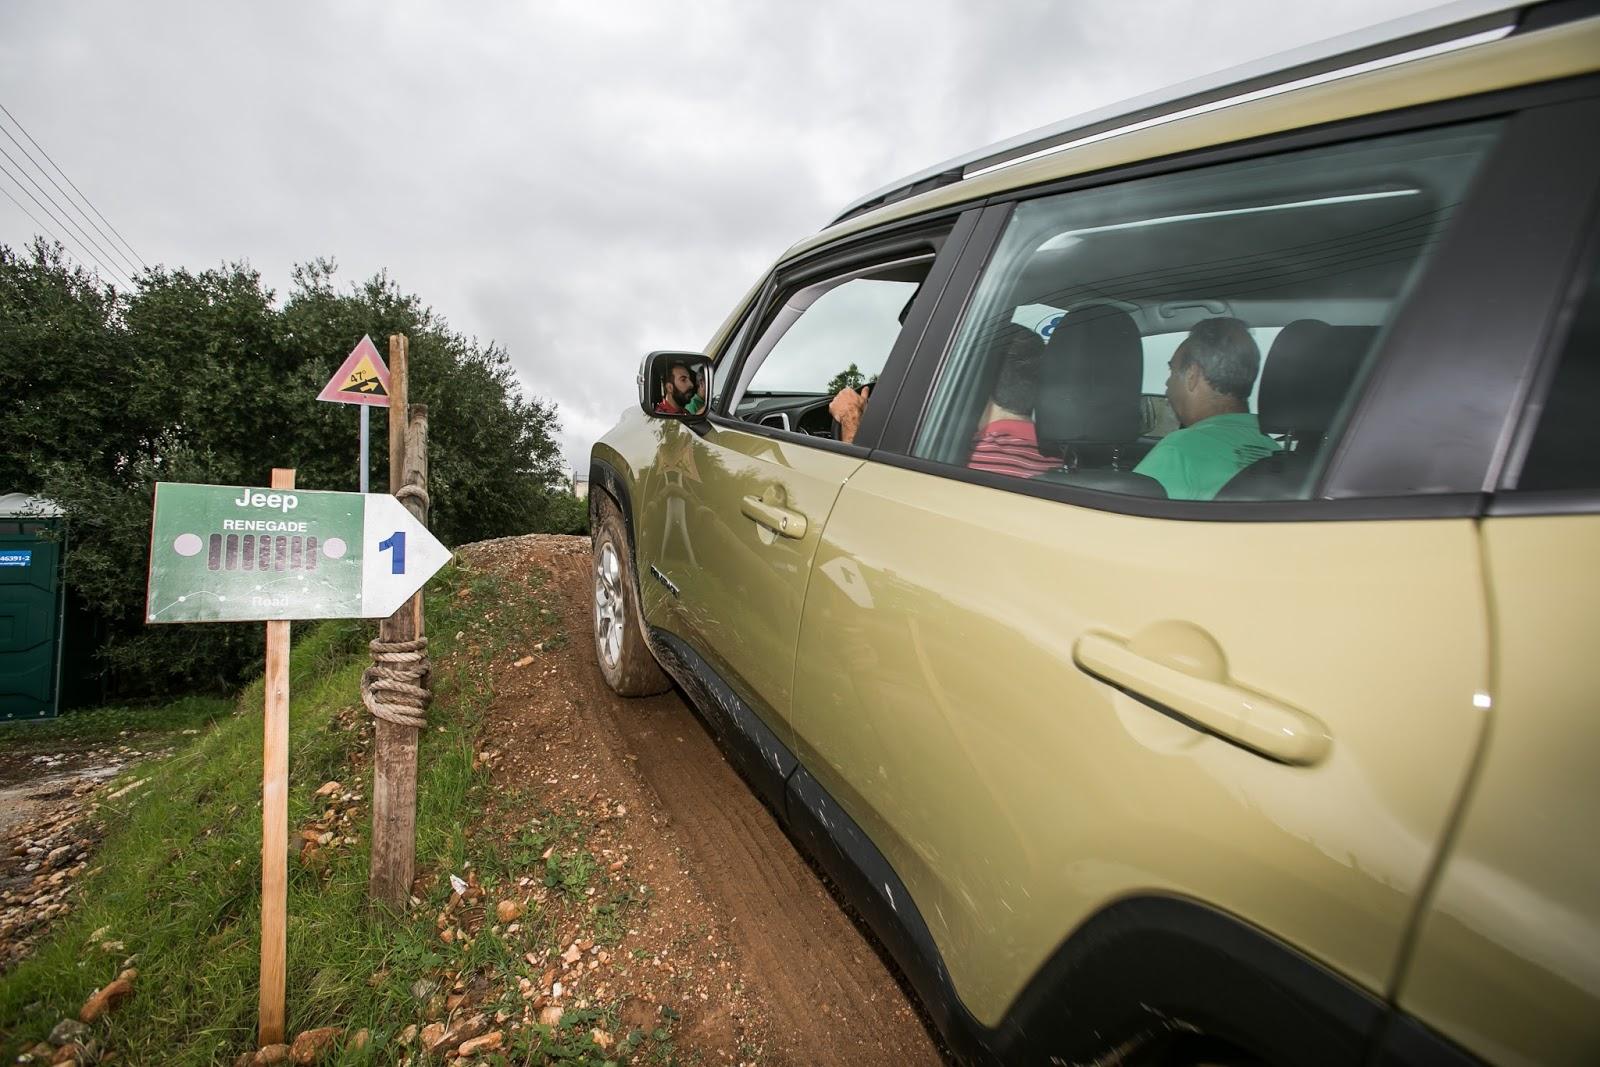 GK 0357 Πετάμε ένα Jeep Renegade σε λάσπες, πέτρες, άμμο, λίμνες. Θα τα καταφέρει; Jeep, Jeep Renegade, Renegade, SUV, TEST, zblog, ΔΟΚΙΜΕΣ